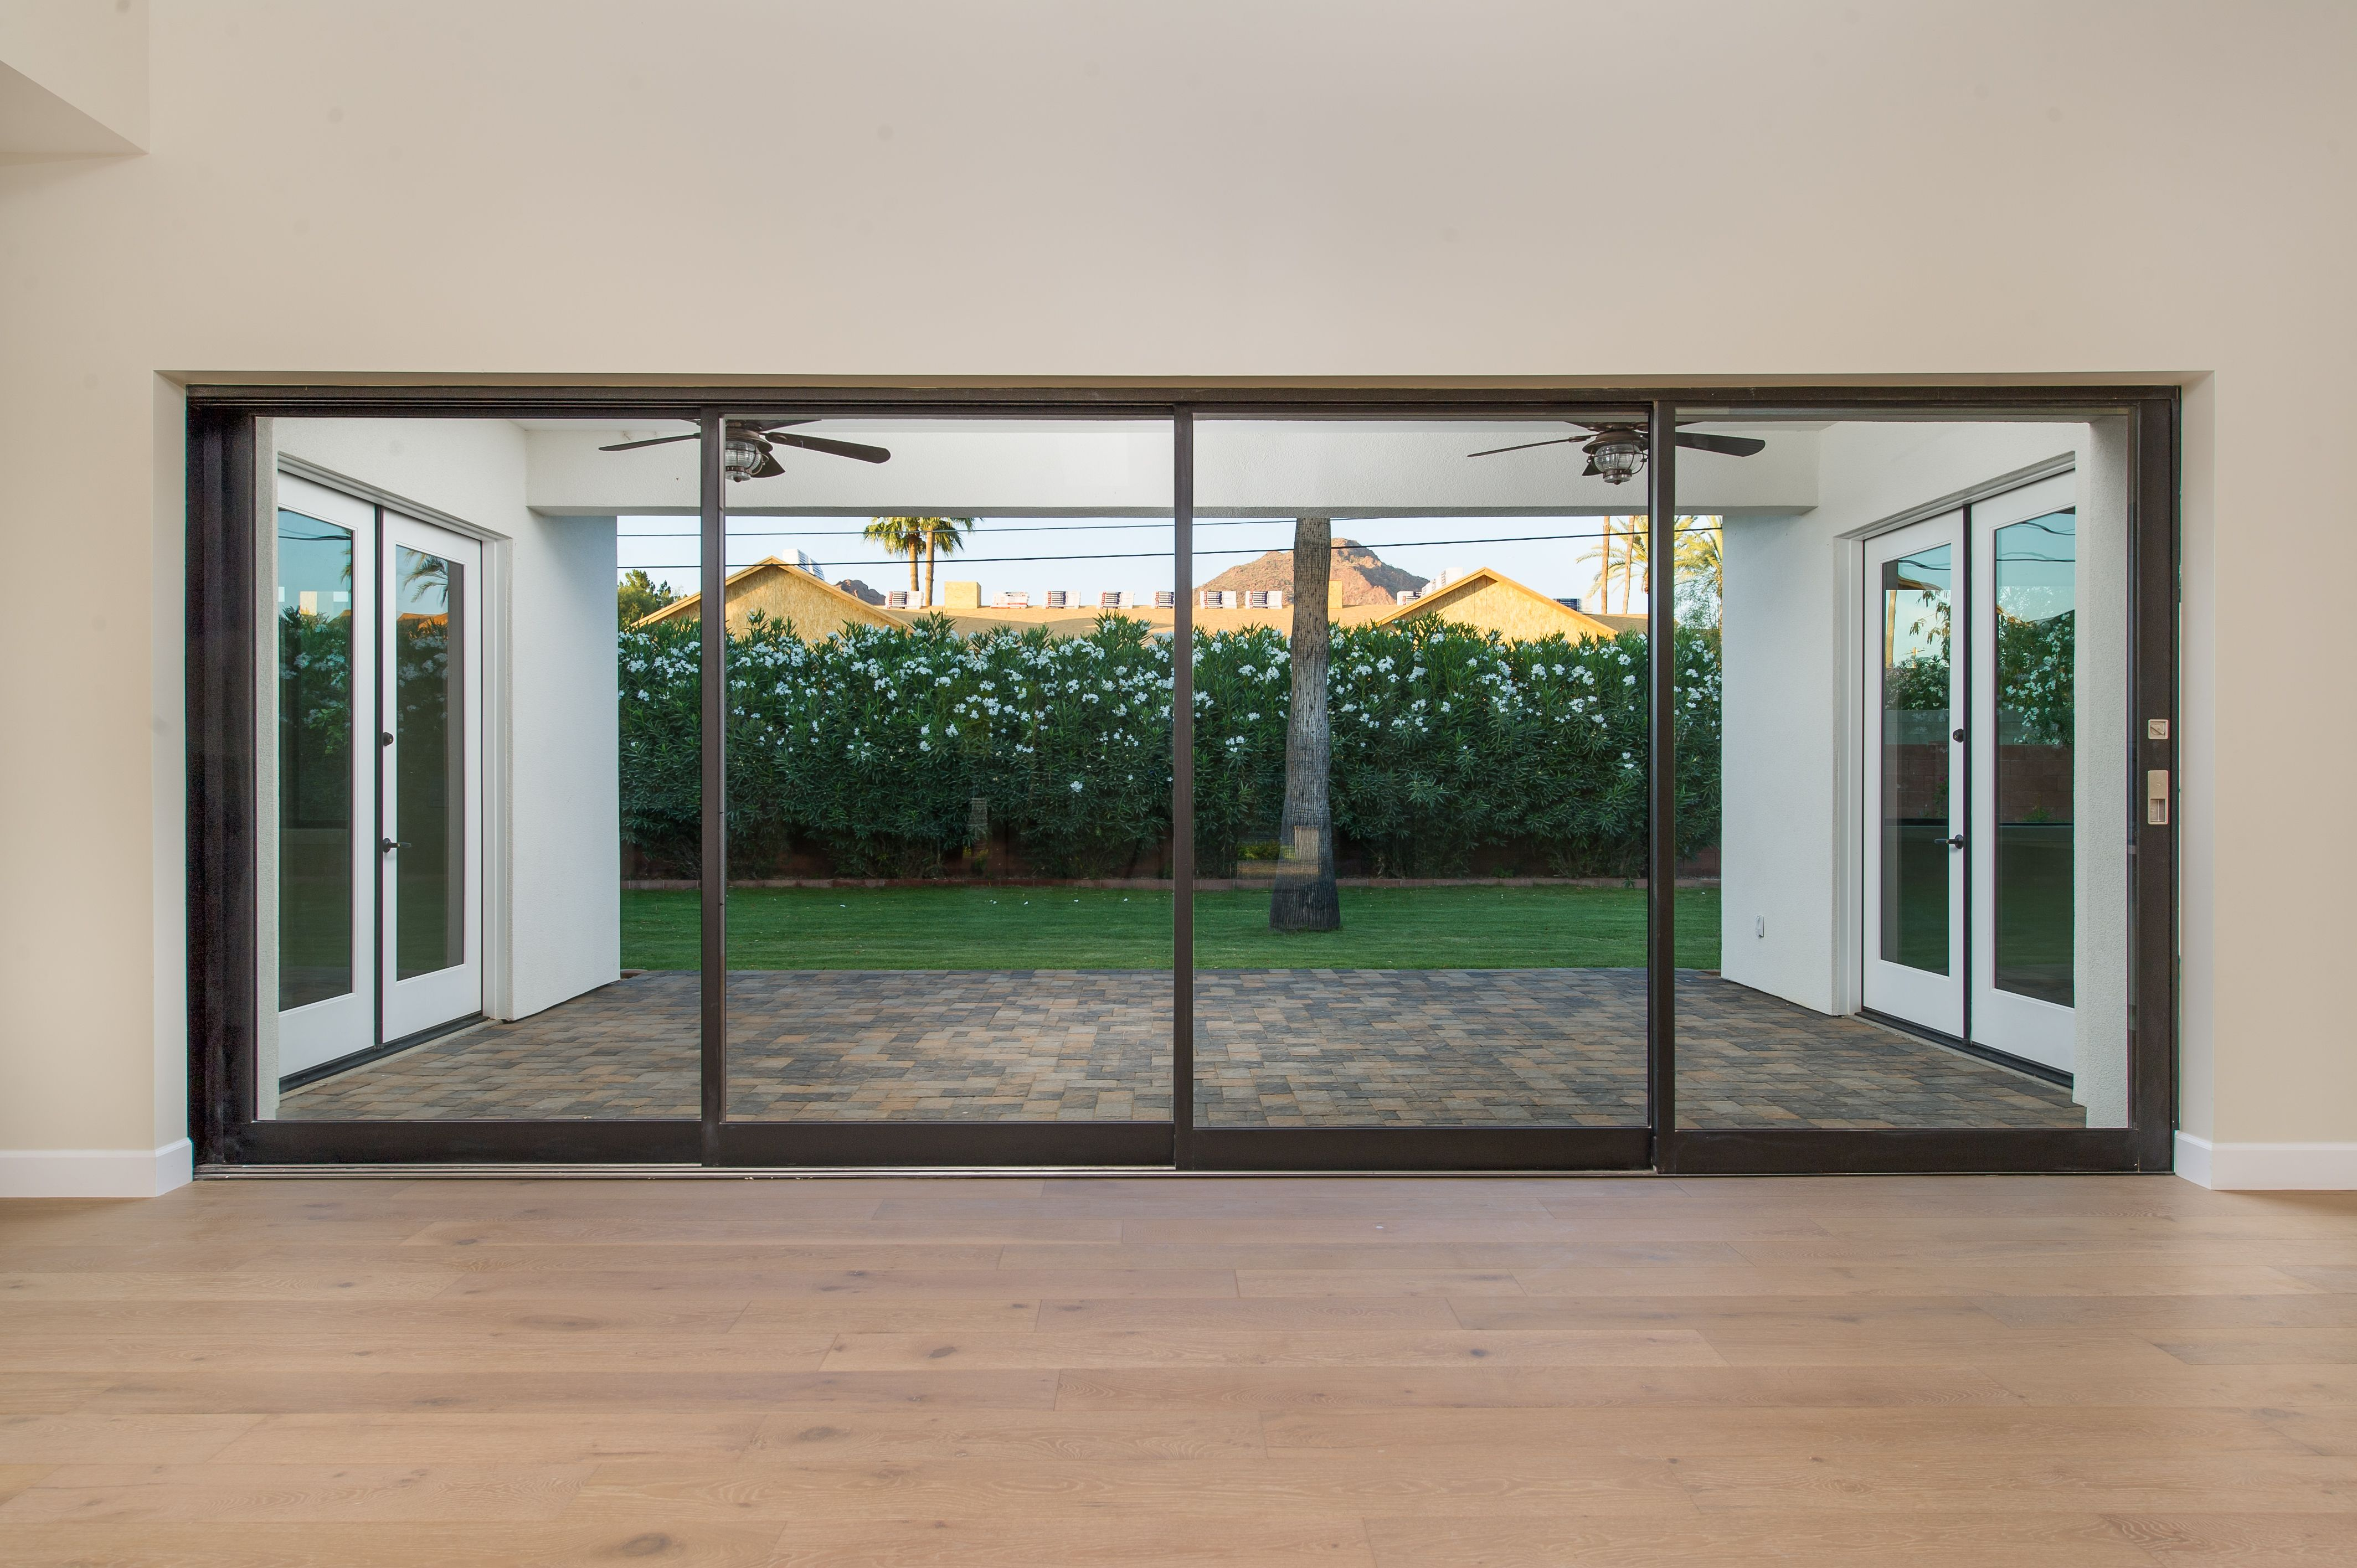 Arcadia Smart Homes   Model Home. 20u0027 Foot Sliding Glass Patio Door  Retracts Into Pocket Creating Seamless Integration Between Indoor And  Outdoor Space!